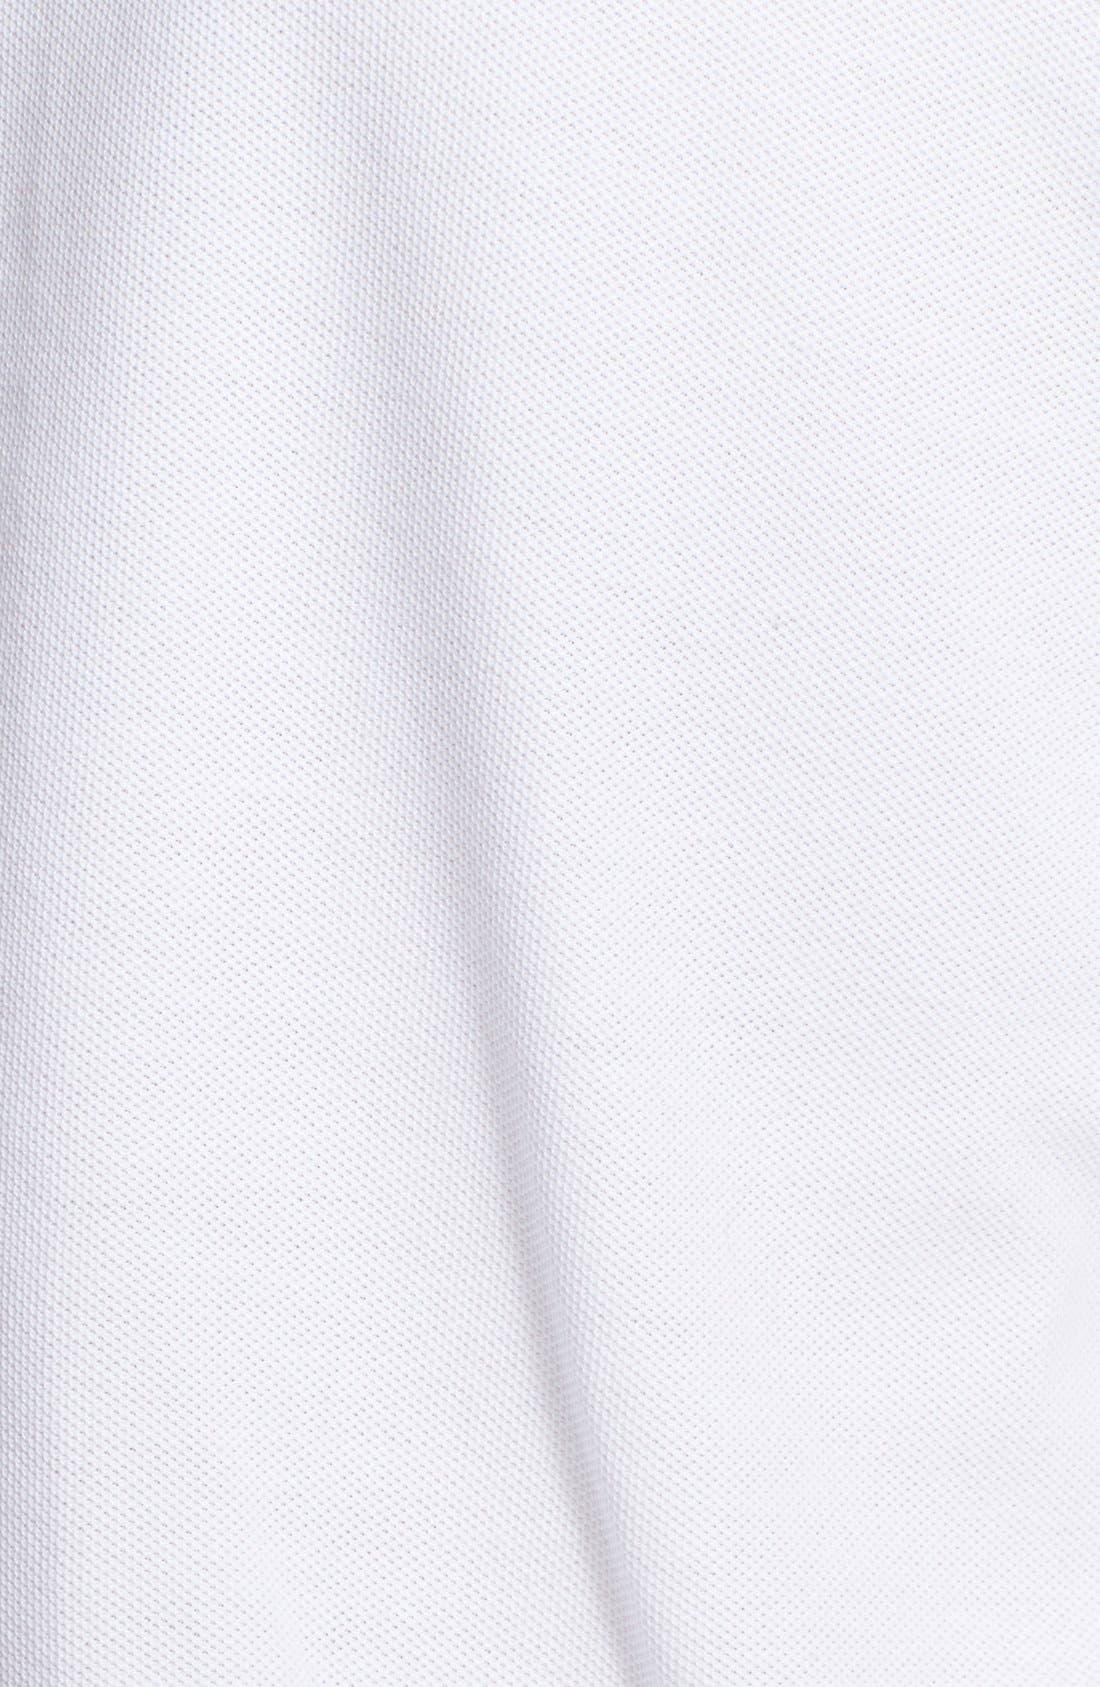 Stitched Collar Cotton Piqué Polo,                             Alternate thumbnail 8, color,                             100